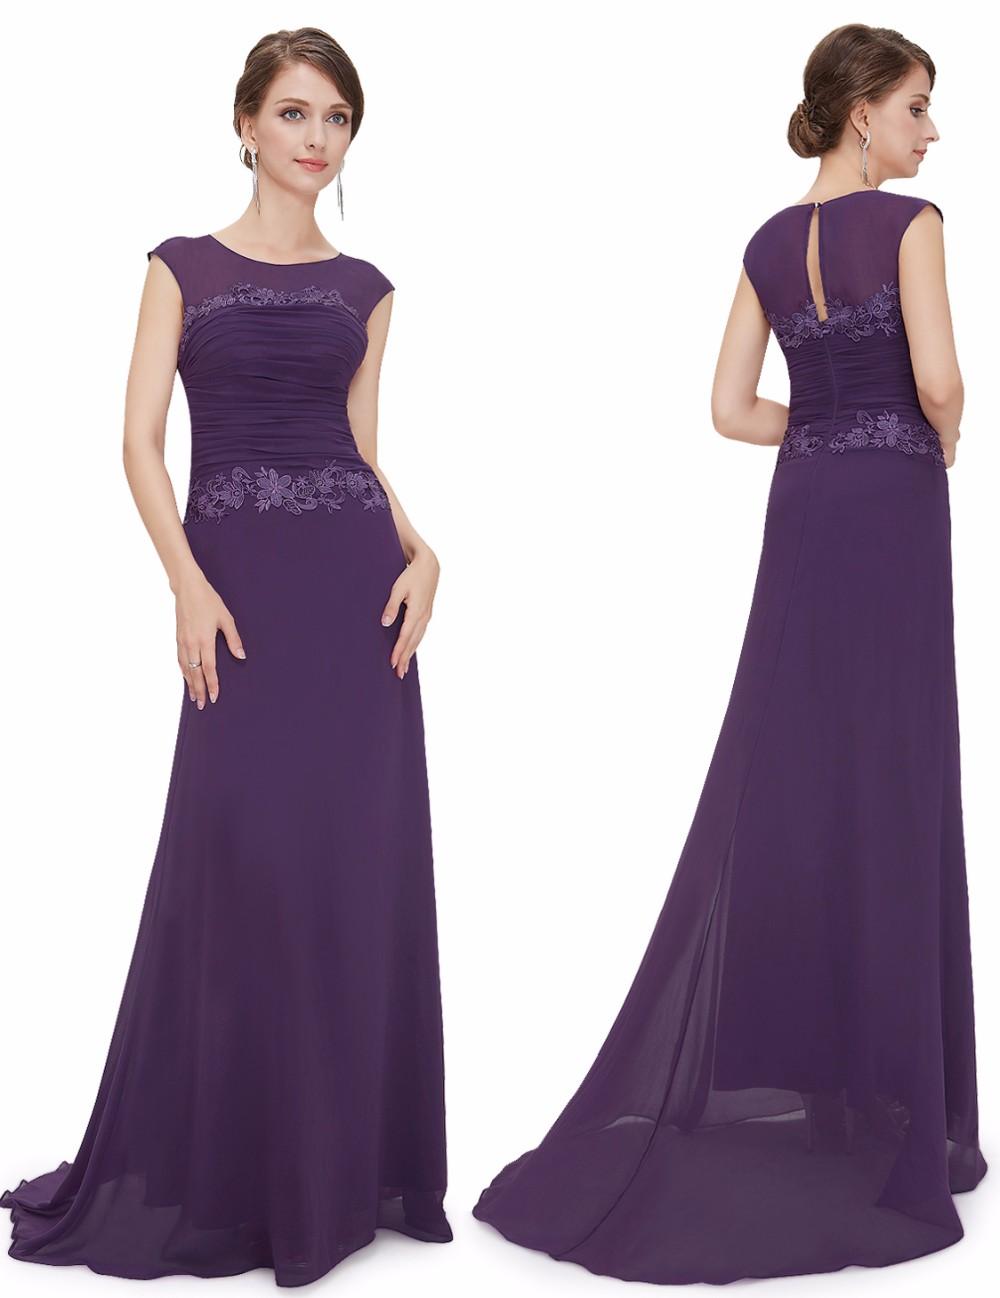 Round Neck Long Elegant Bridesmaid Party Dress